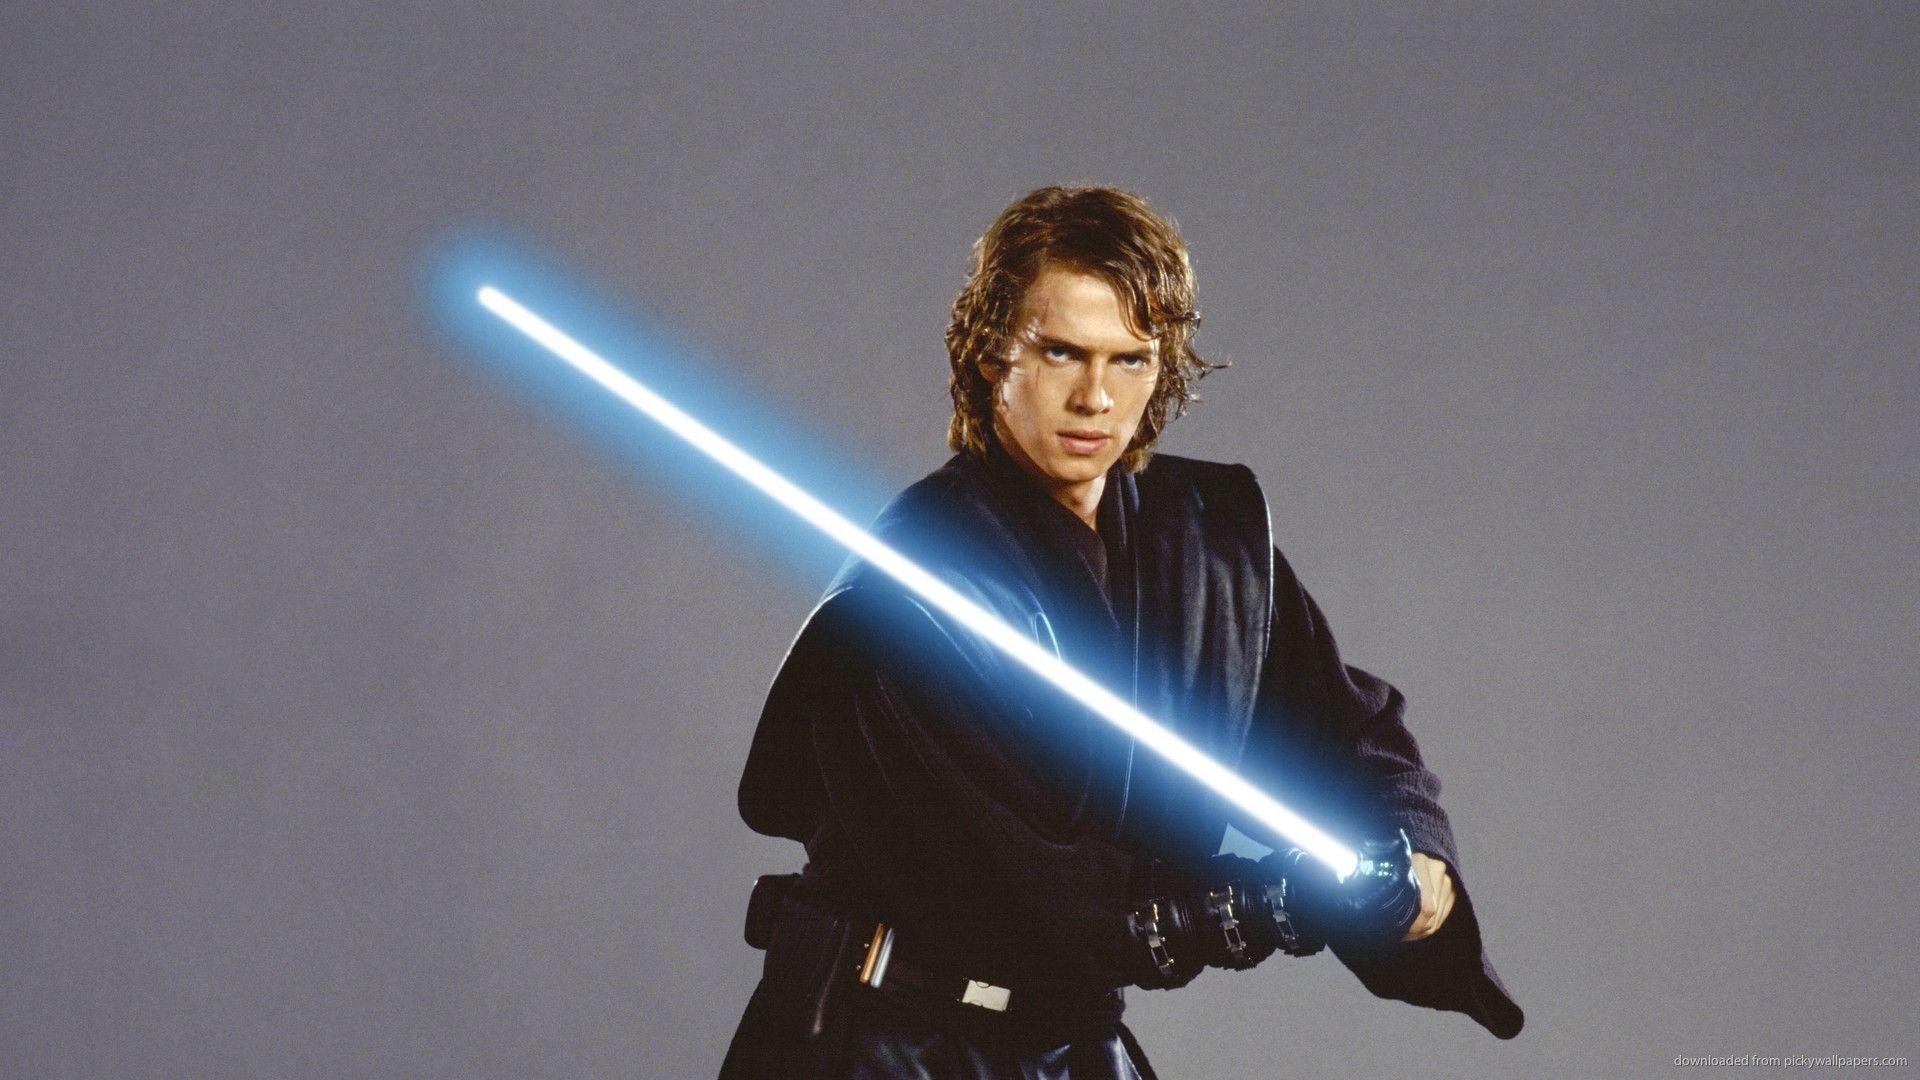 Anakin Skywalker Star Wars Wallpapers Wallpapertag